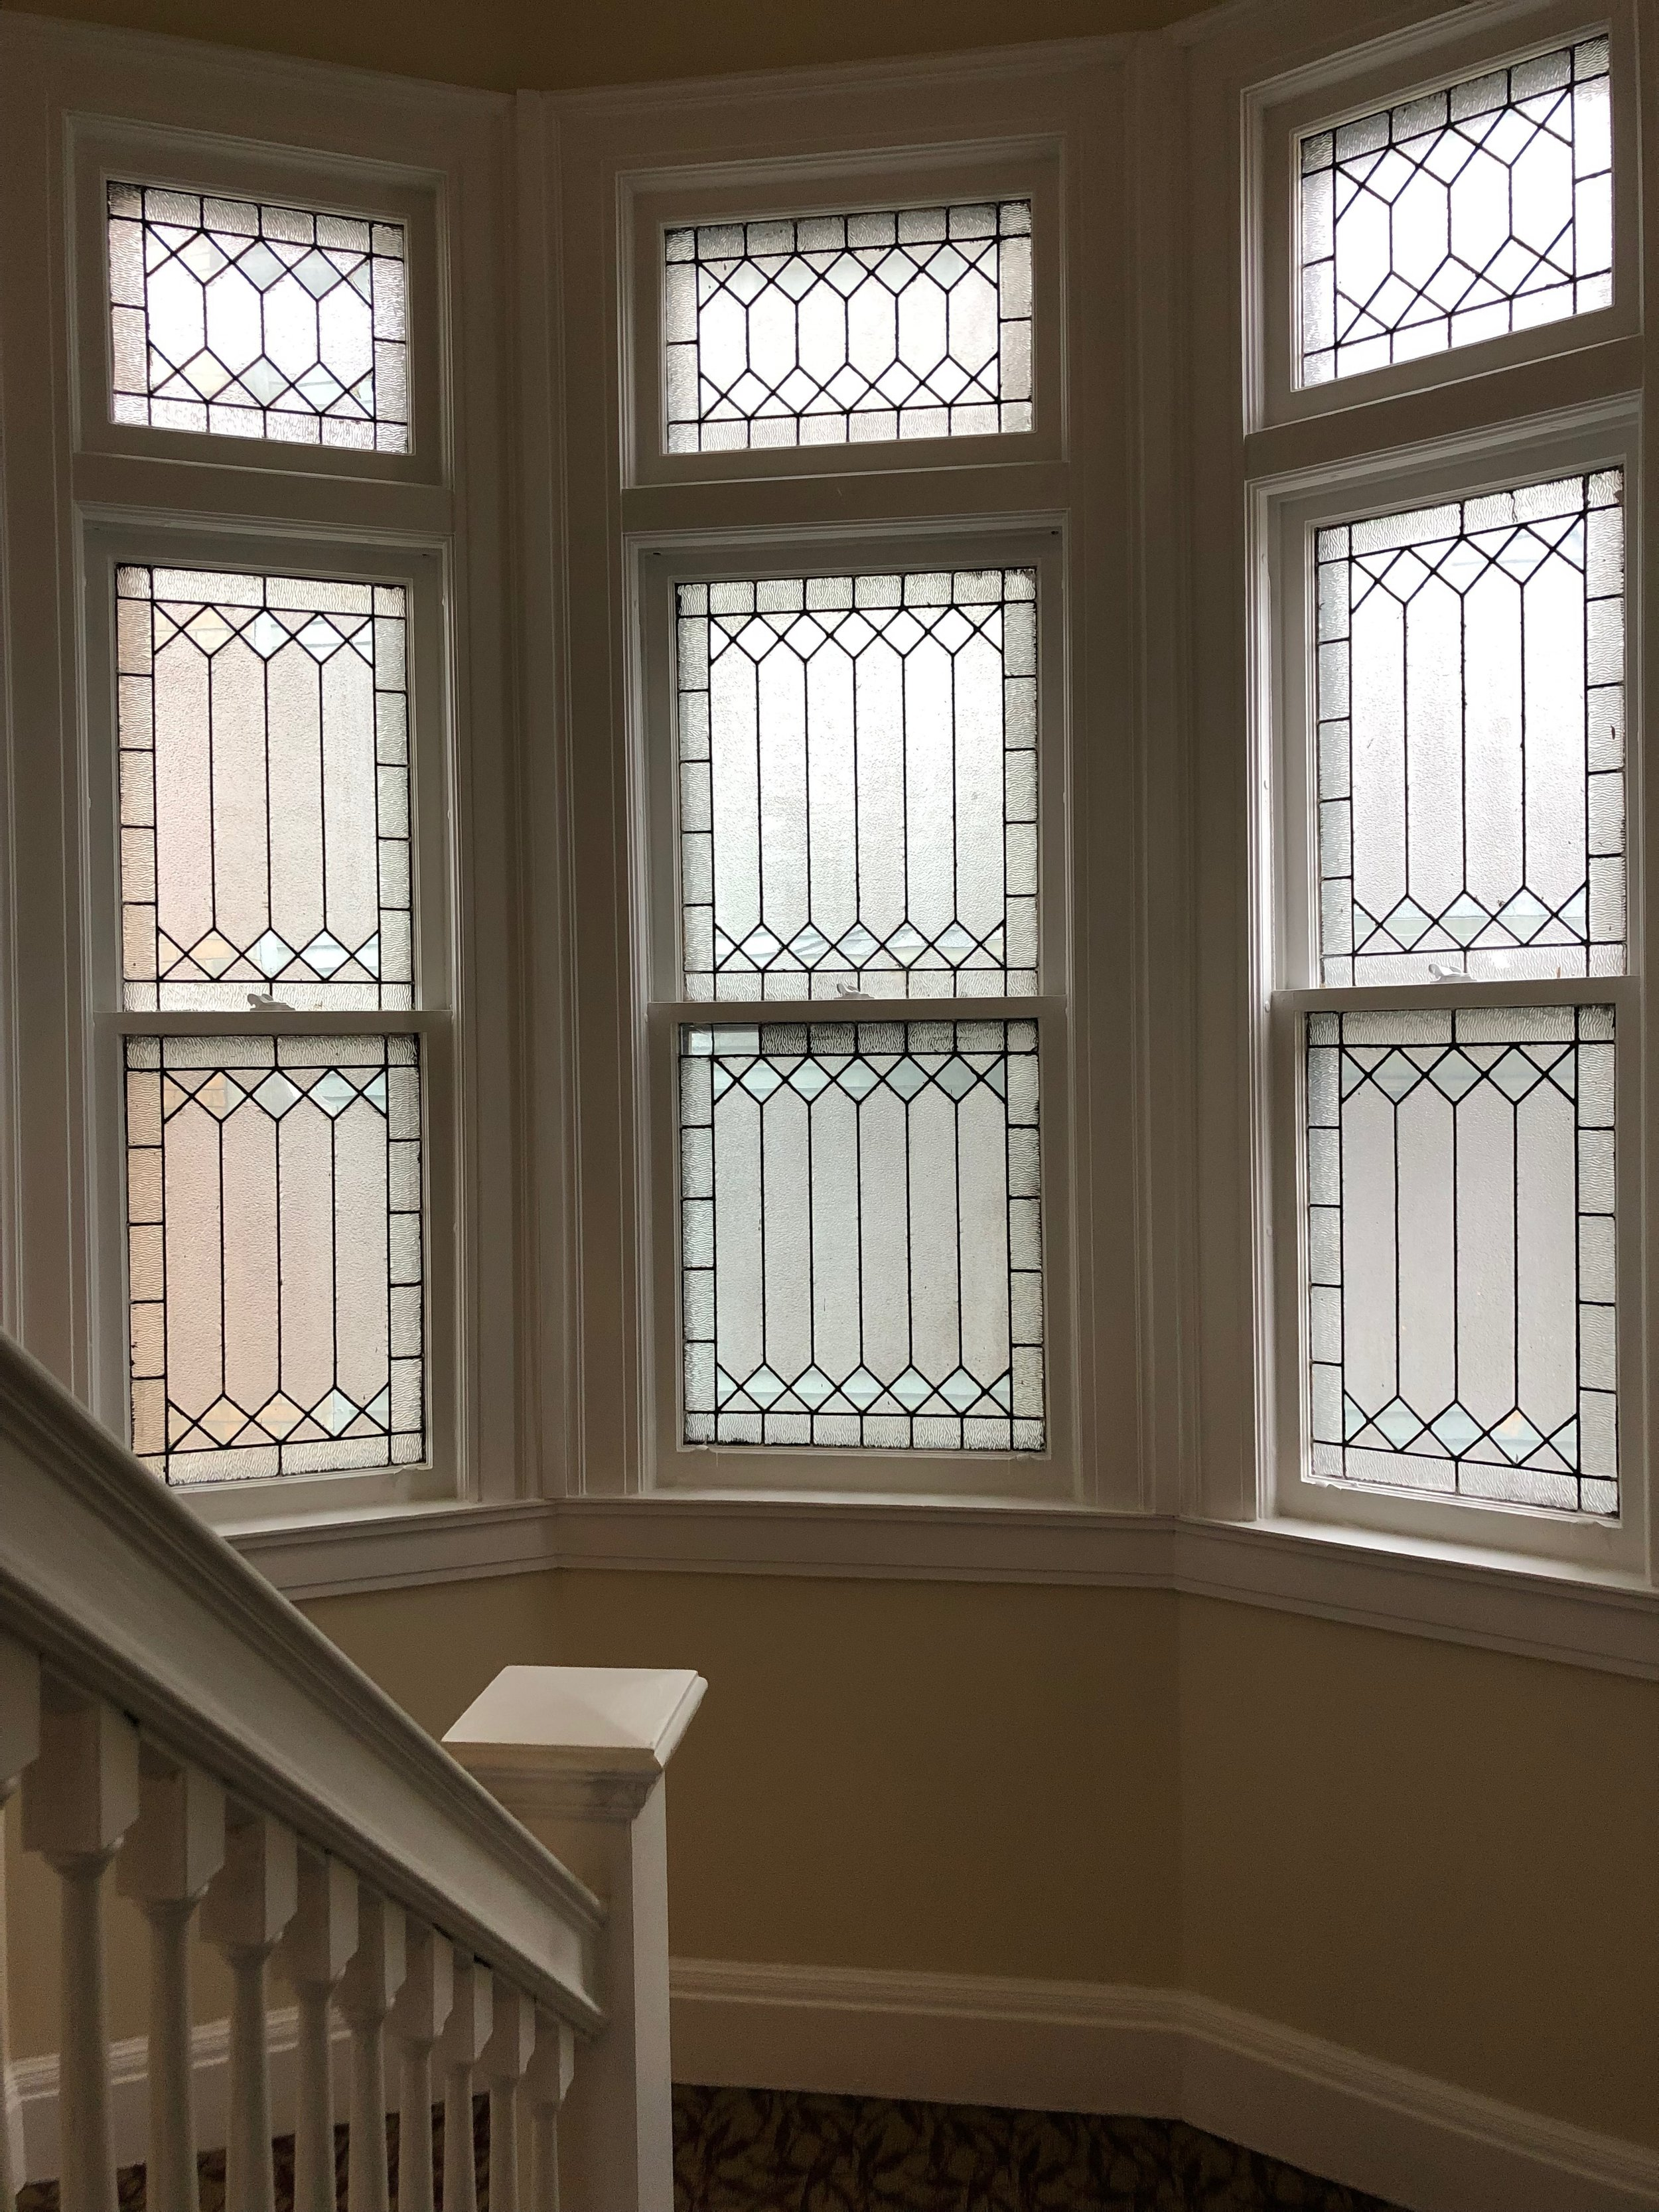 Original Etched-Glass Windows